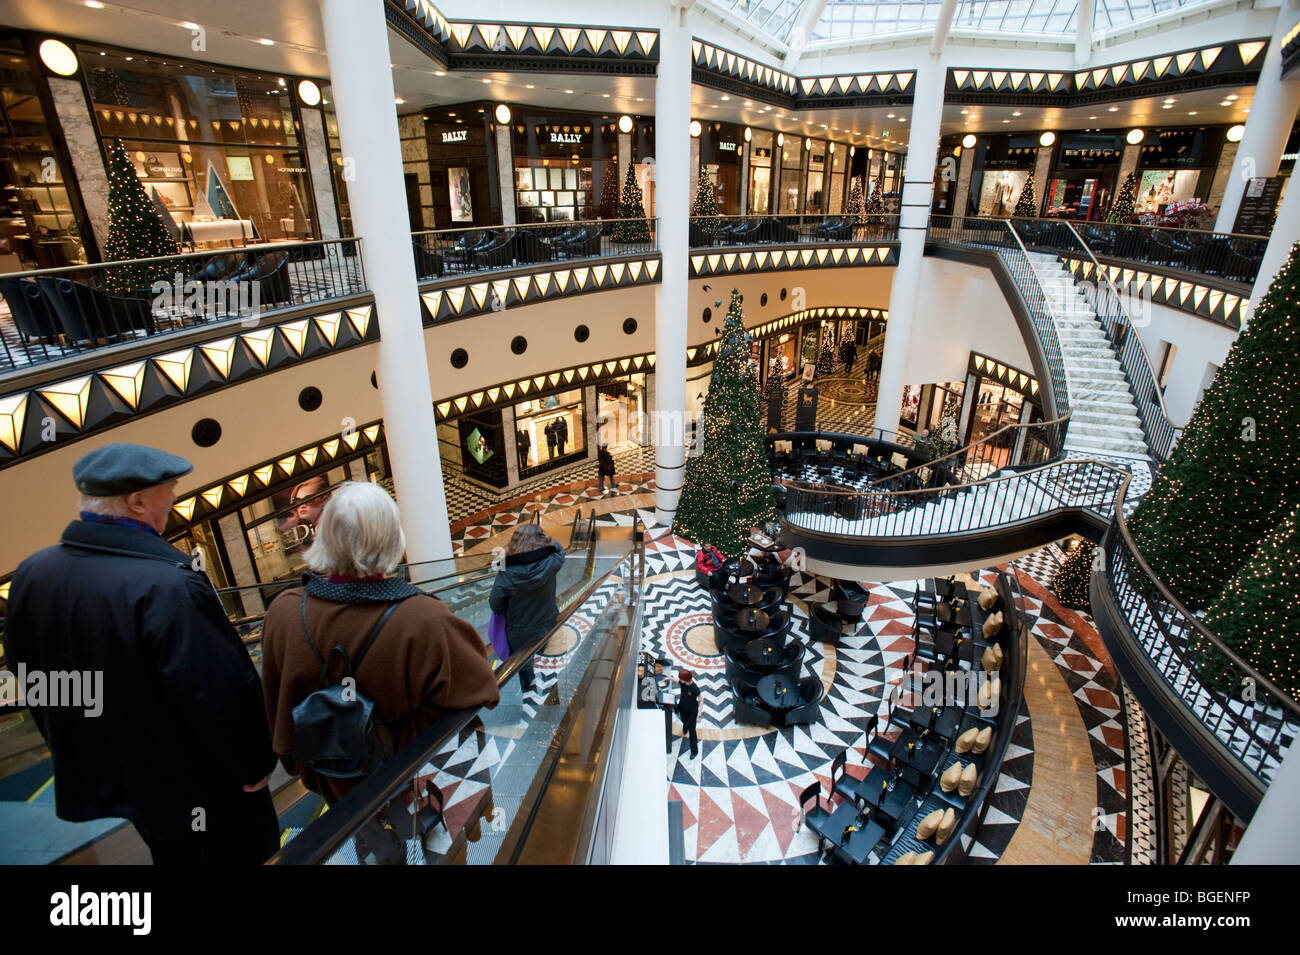 Interior view of beautiful elegant atrium inside Quartier 206 upmarket shopping mall on Friedrichstrasse in Mitte - Stock Image